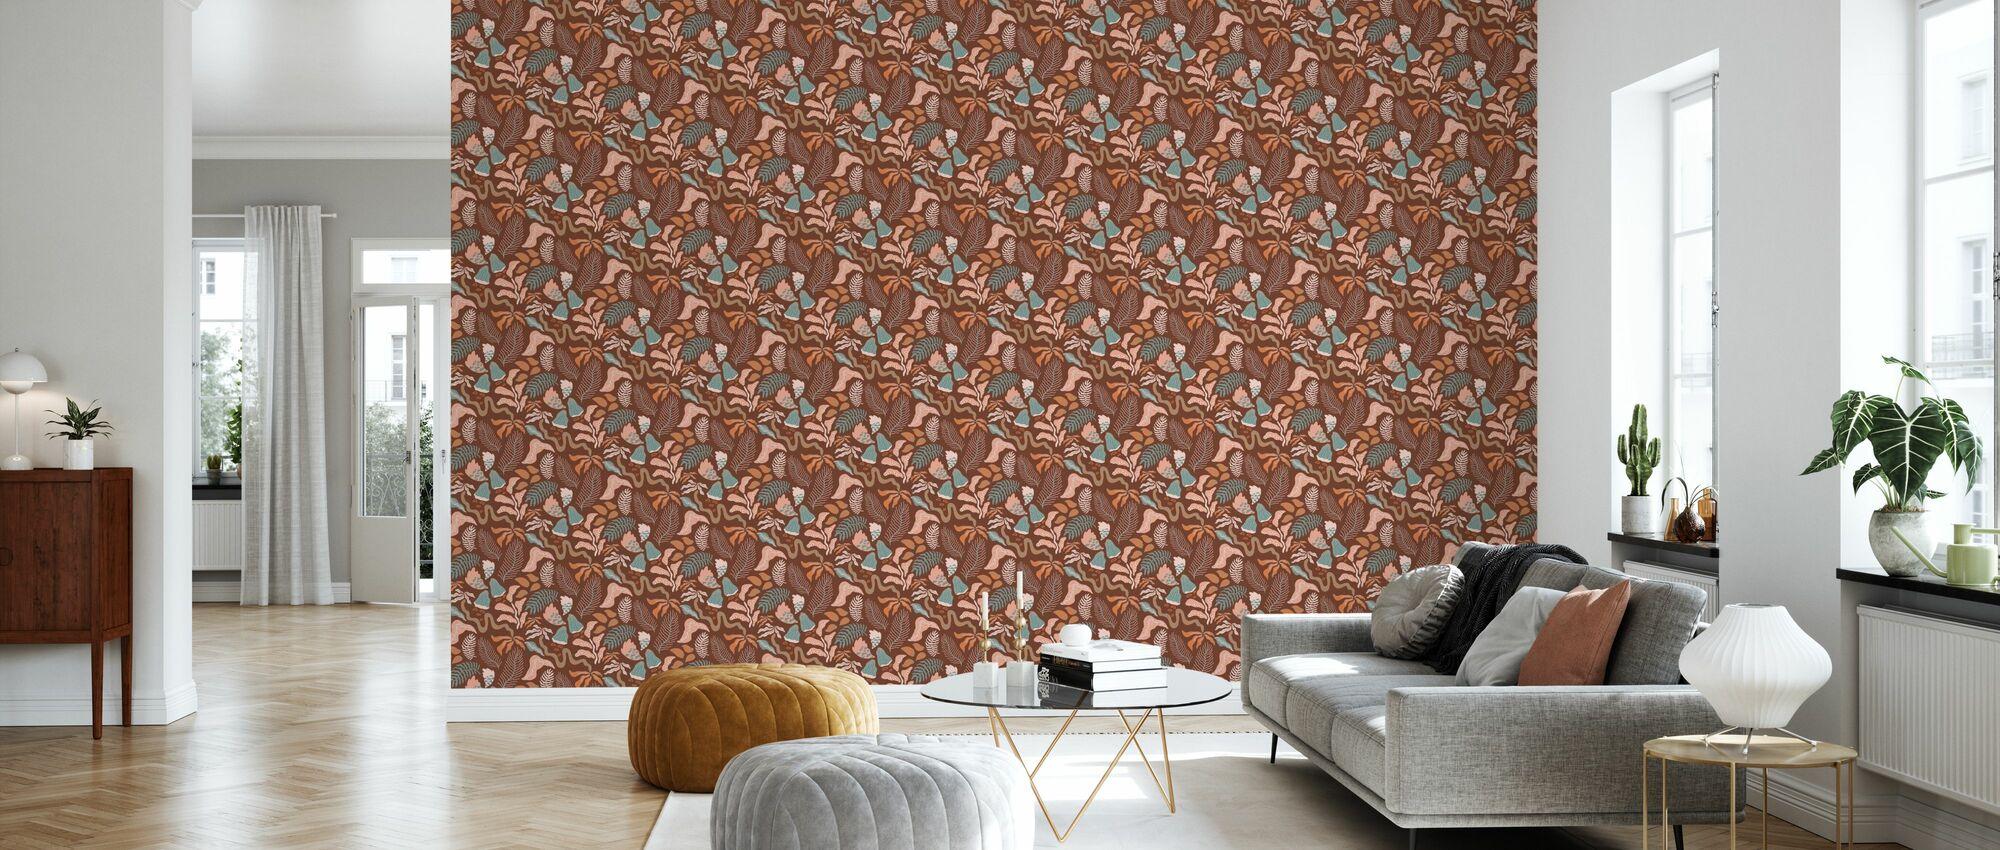 Botanica - Brown - Wallpaper - Living Room